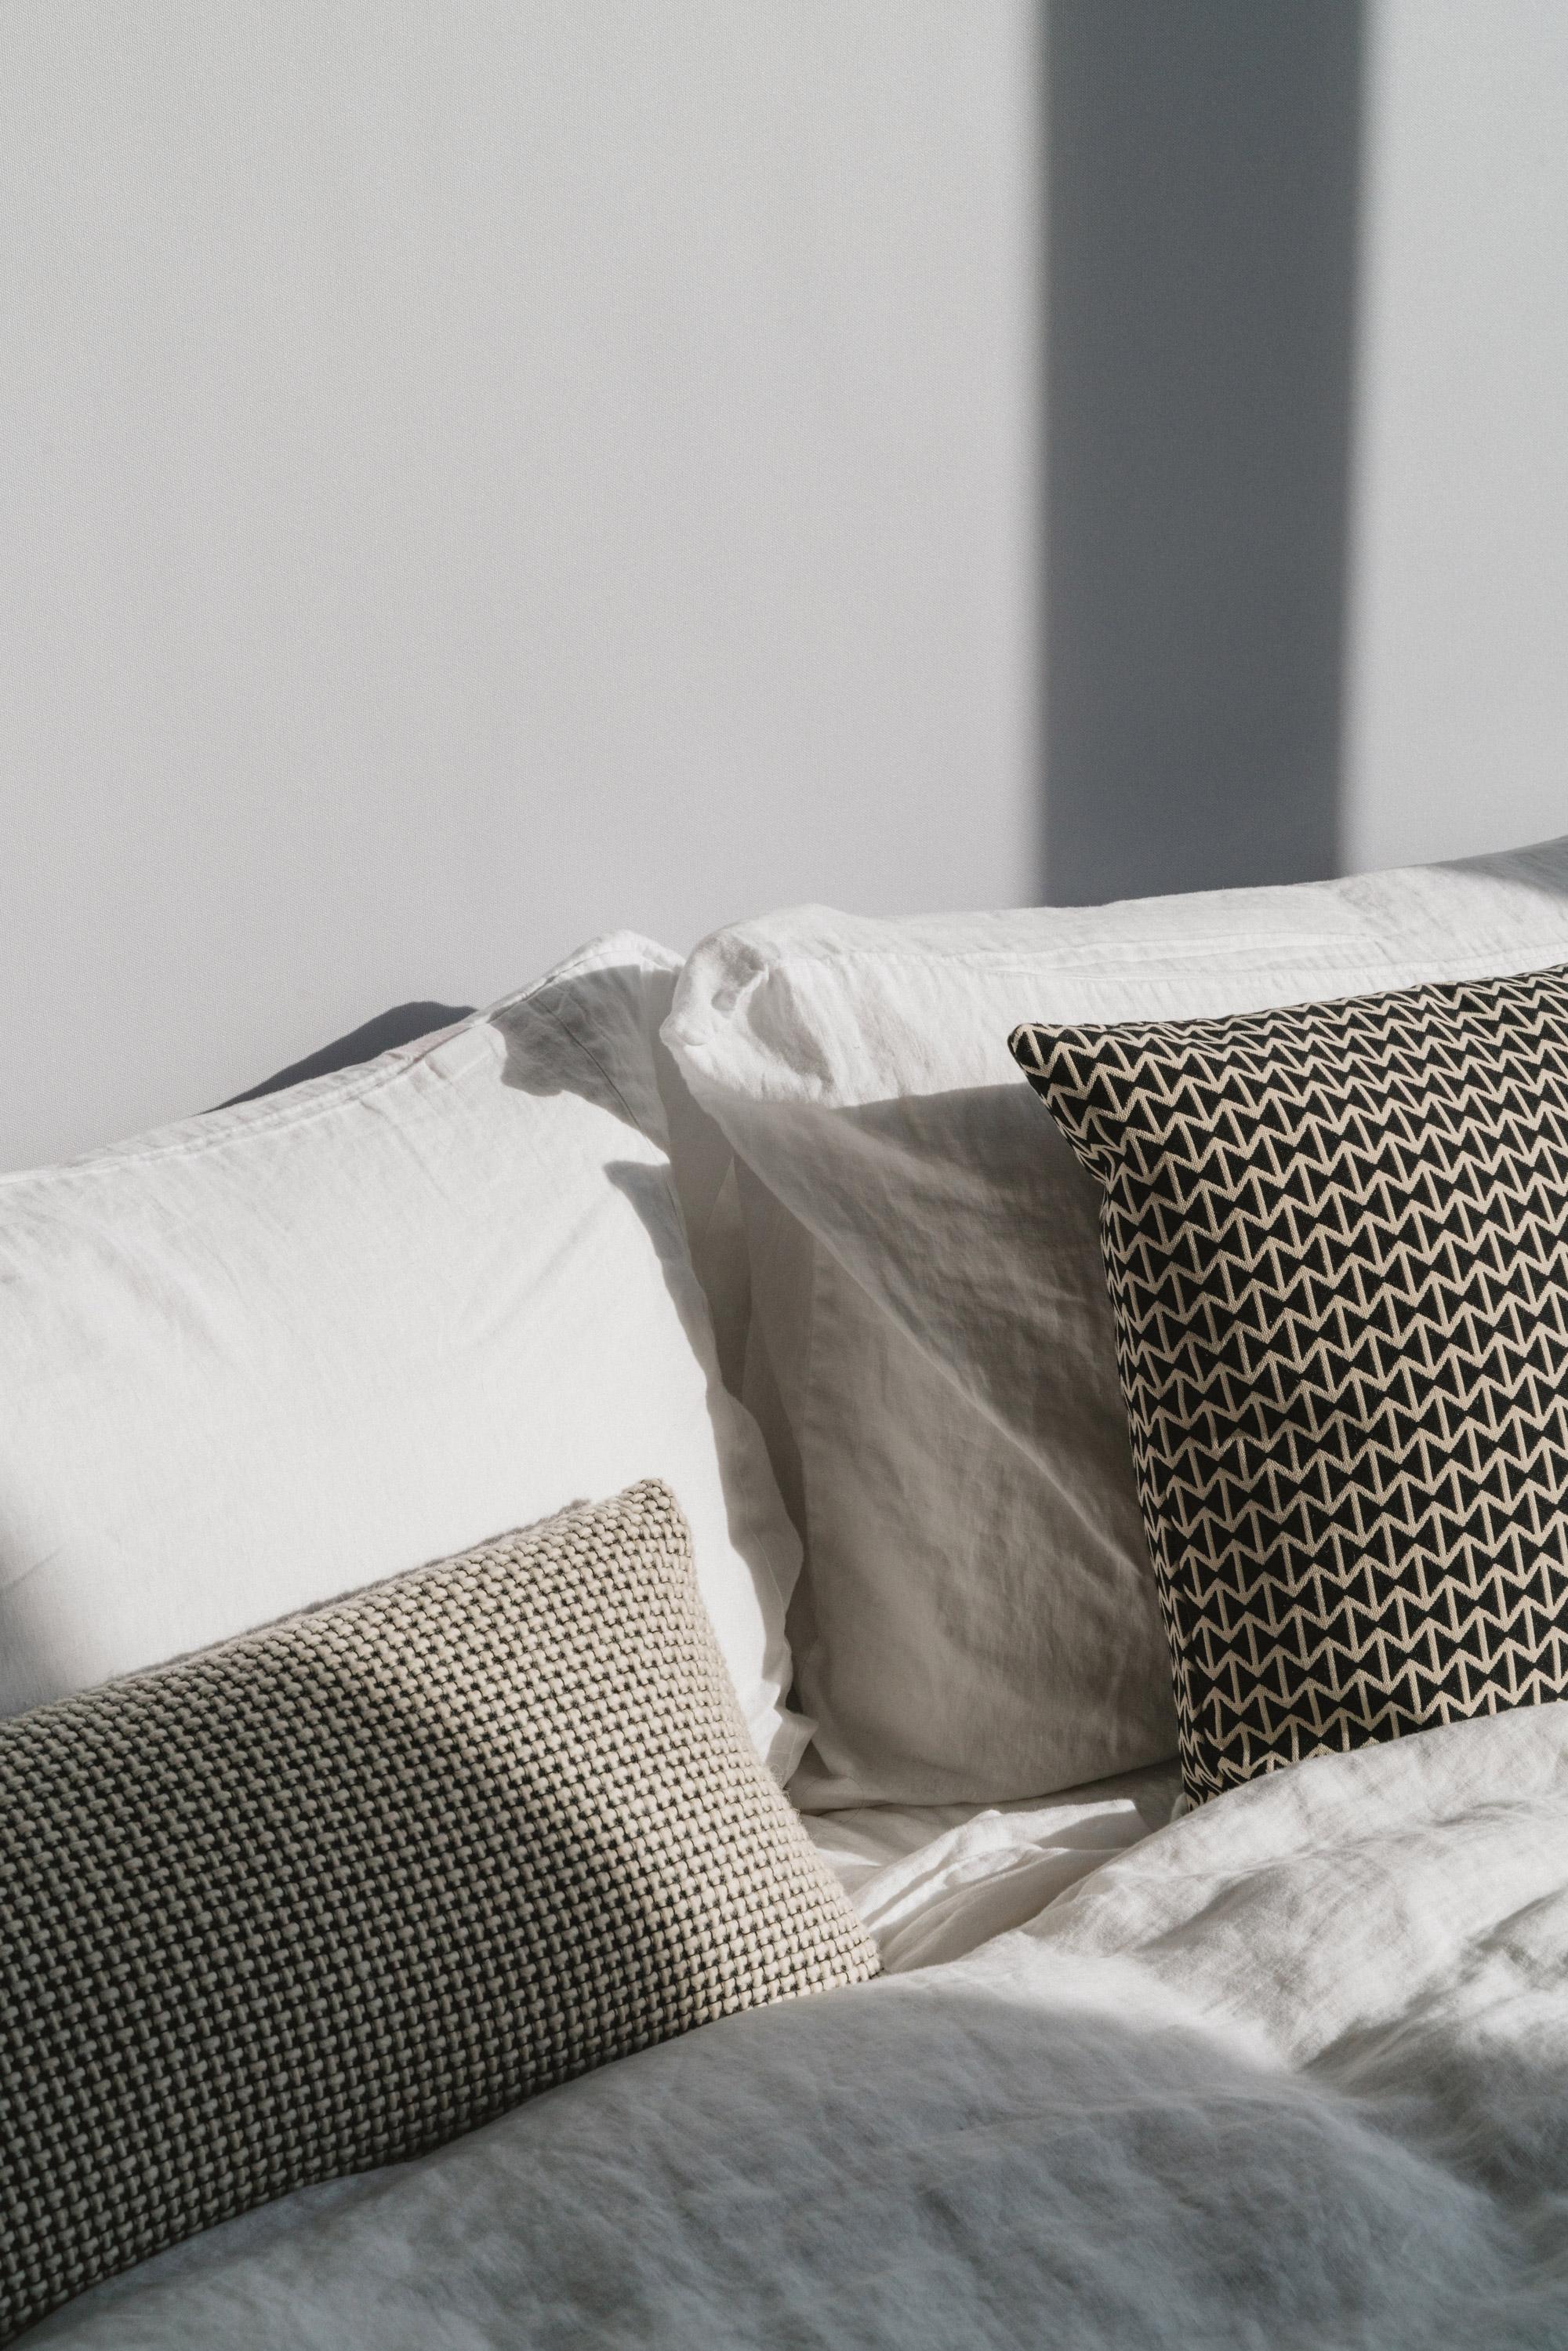 Linen Sheets from Design Within Reach ,  Herman Miller Pillows